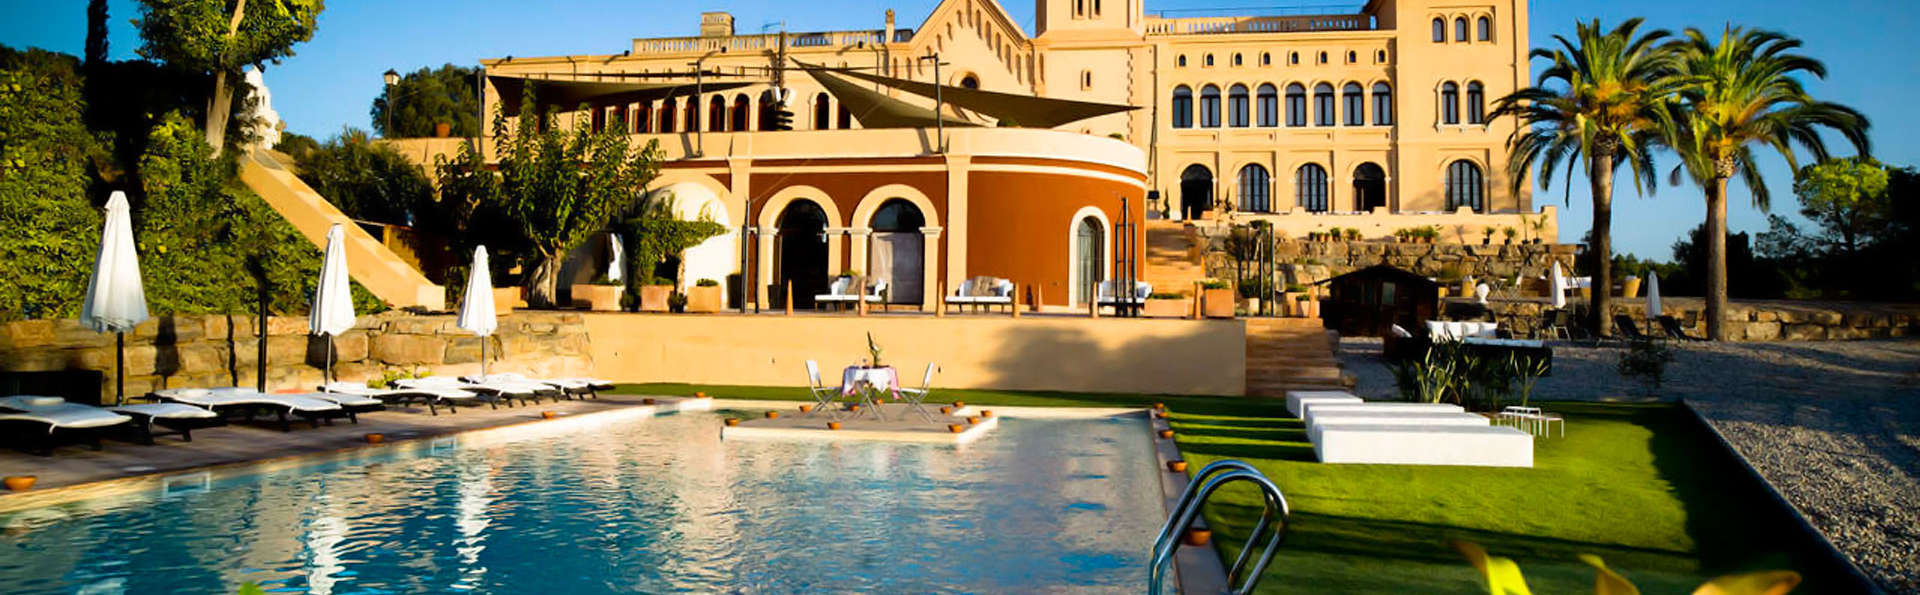 Sant Pere del Bosc hotel & spa - edit_front.jpg